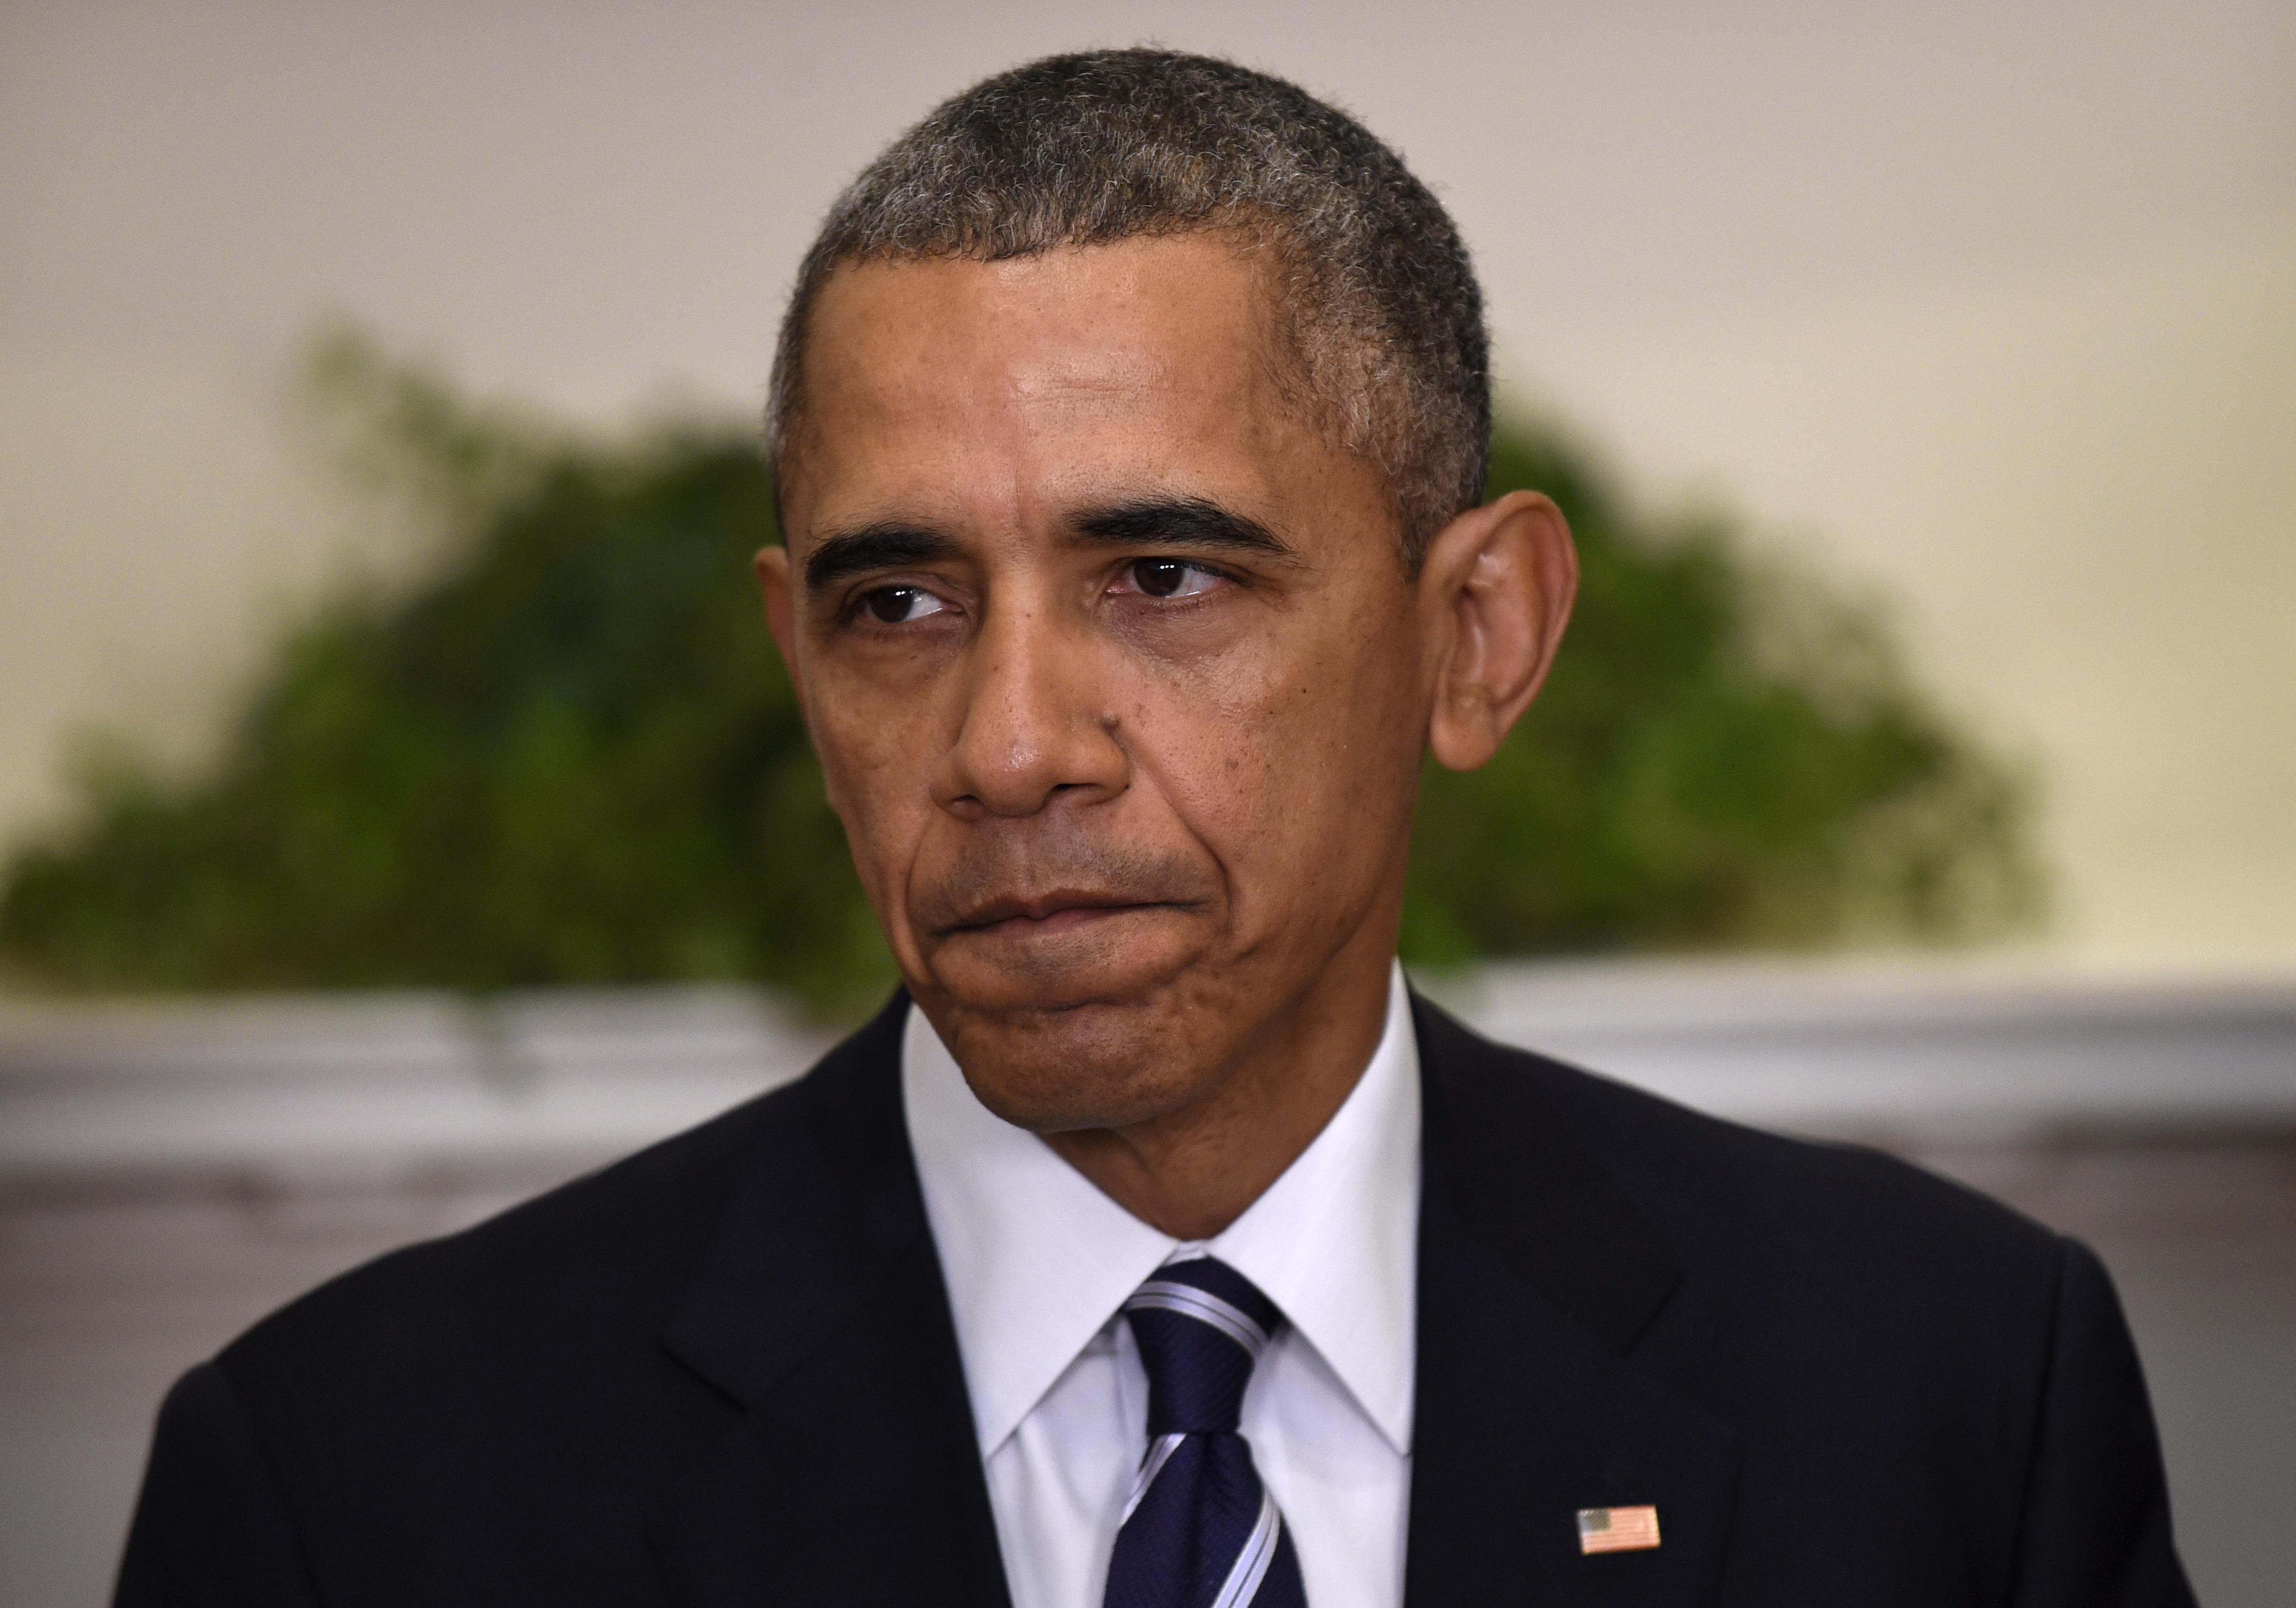 John Kelly cancels Obama\'s 2014 amnesty that courts blocked ...